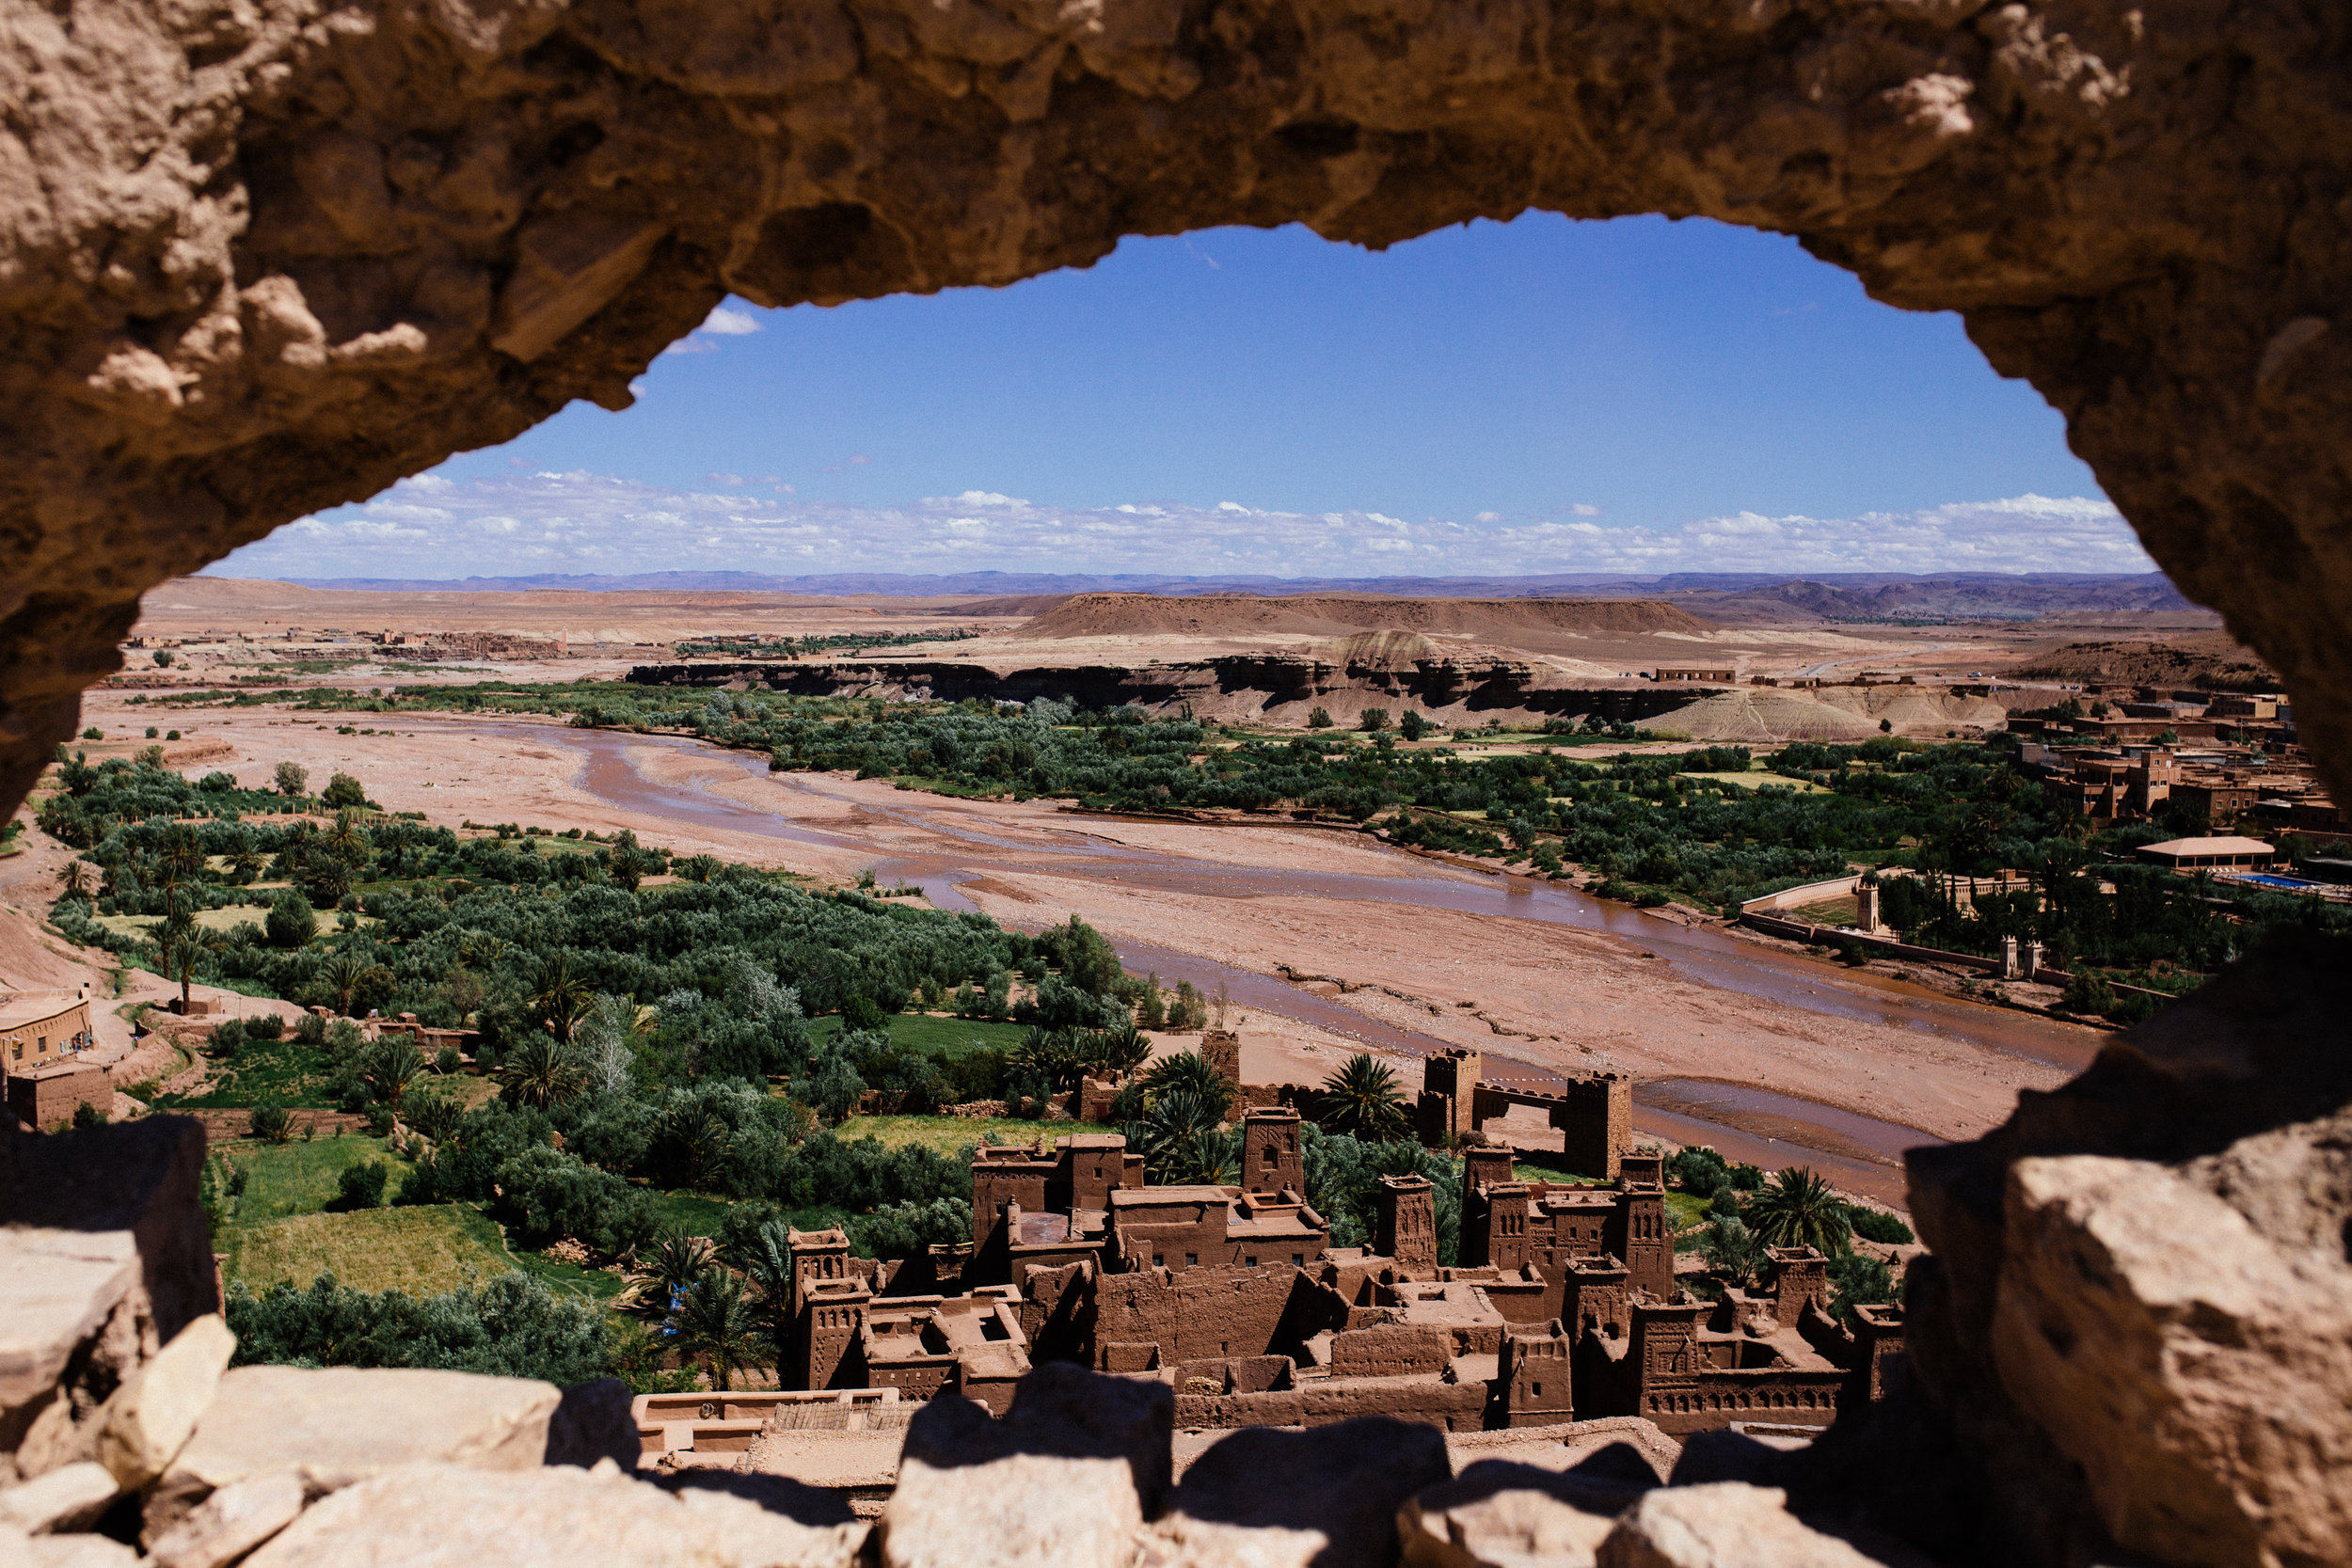 morocco-morocco travel-visit morocco-travel-travel photography-travel photographer-alina mendoza-alina mendoza photography-44.jpg